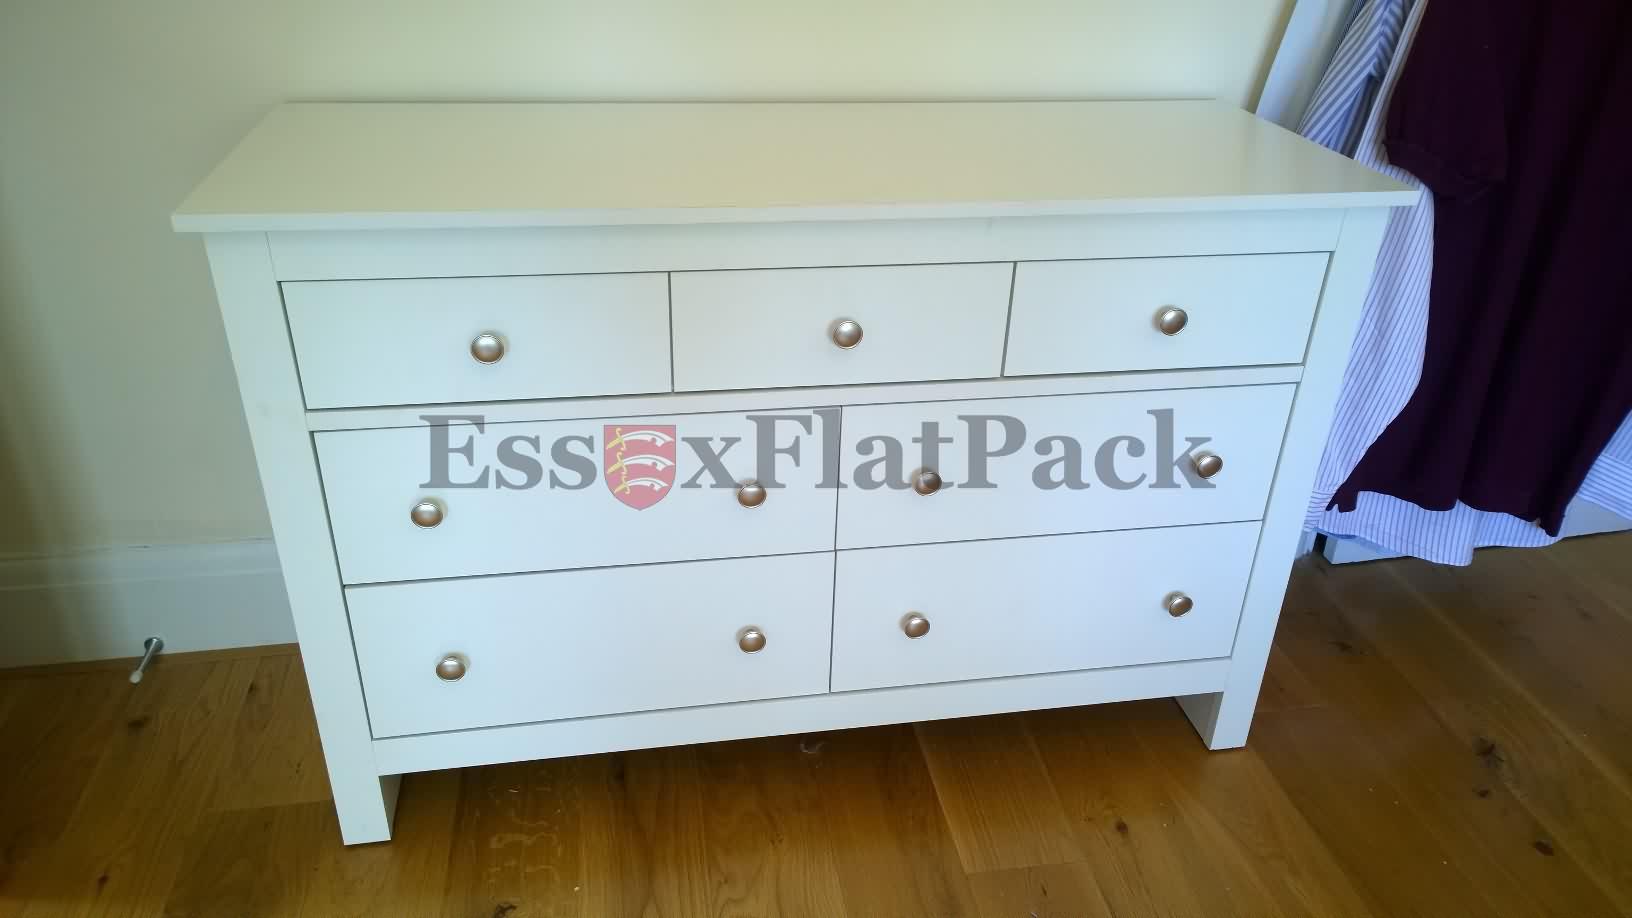 essexflatpack-furniture-20150708180110.jpg